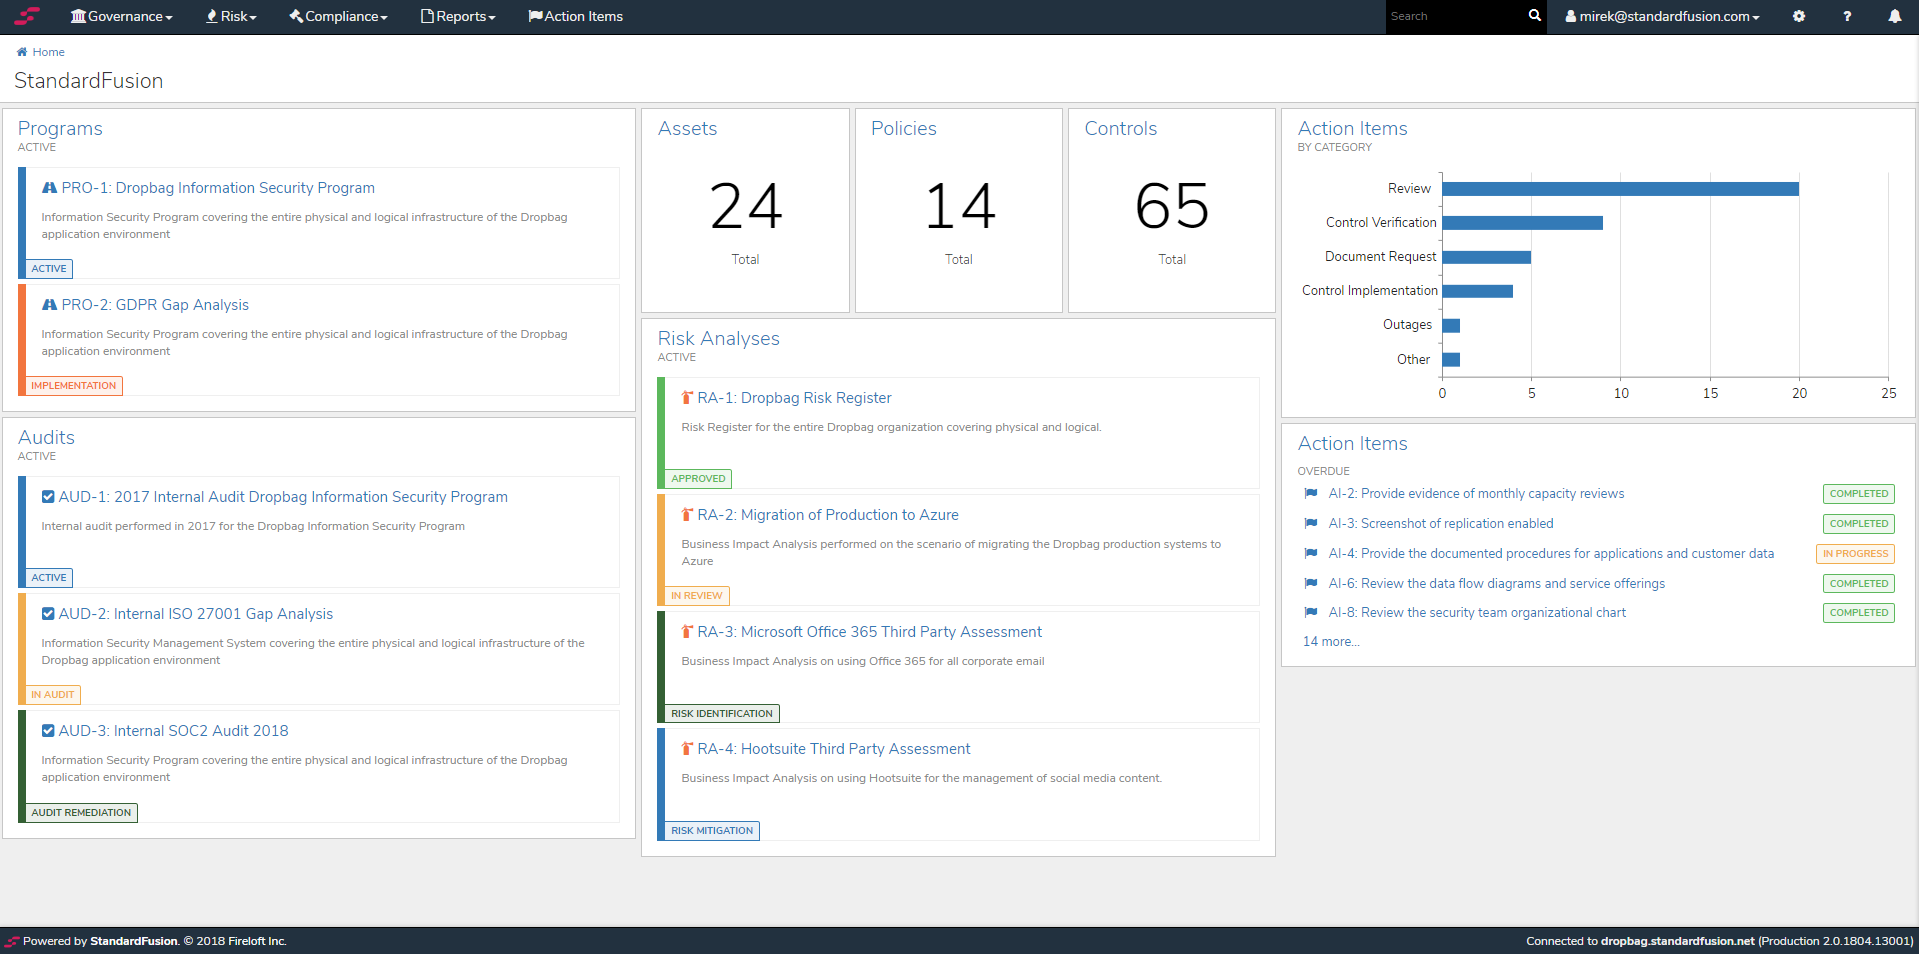 StandardFusion Software - Dashboard